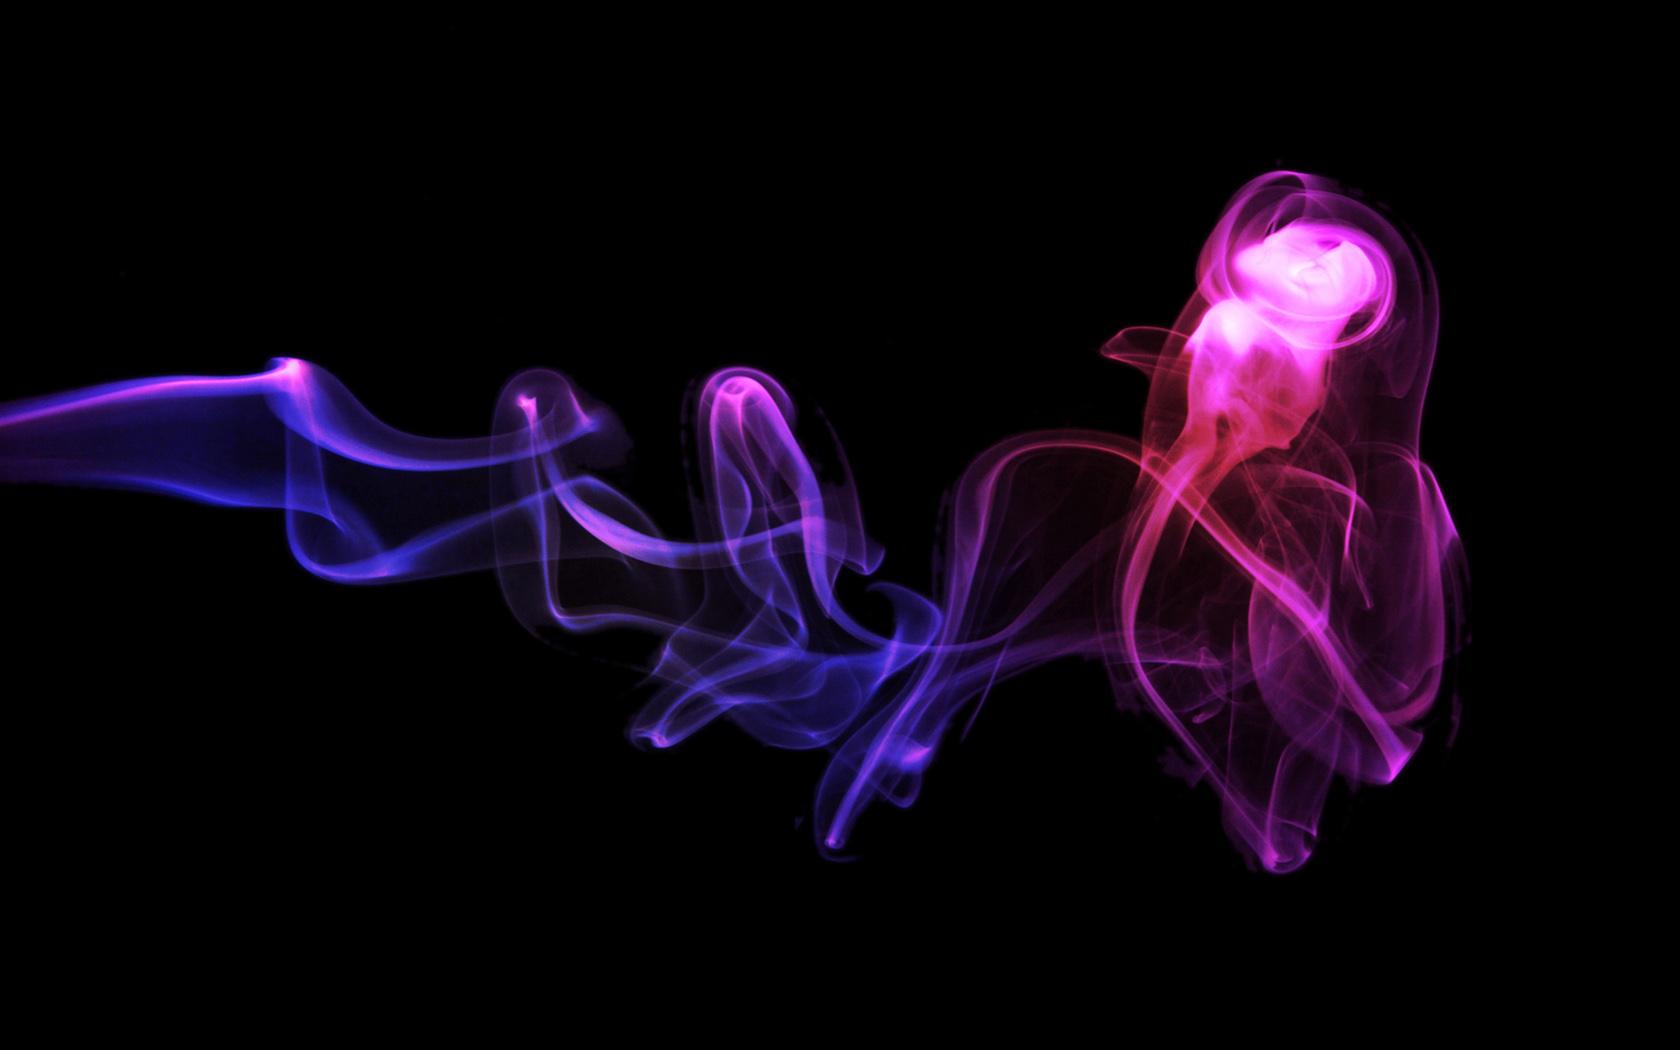 Smoke Wallpapers HD Wallpapers 1680x1050